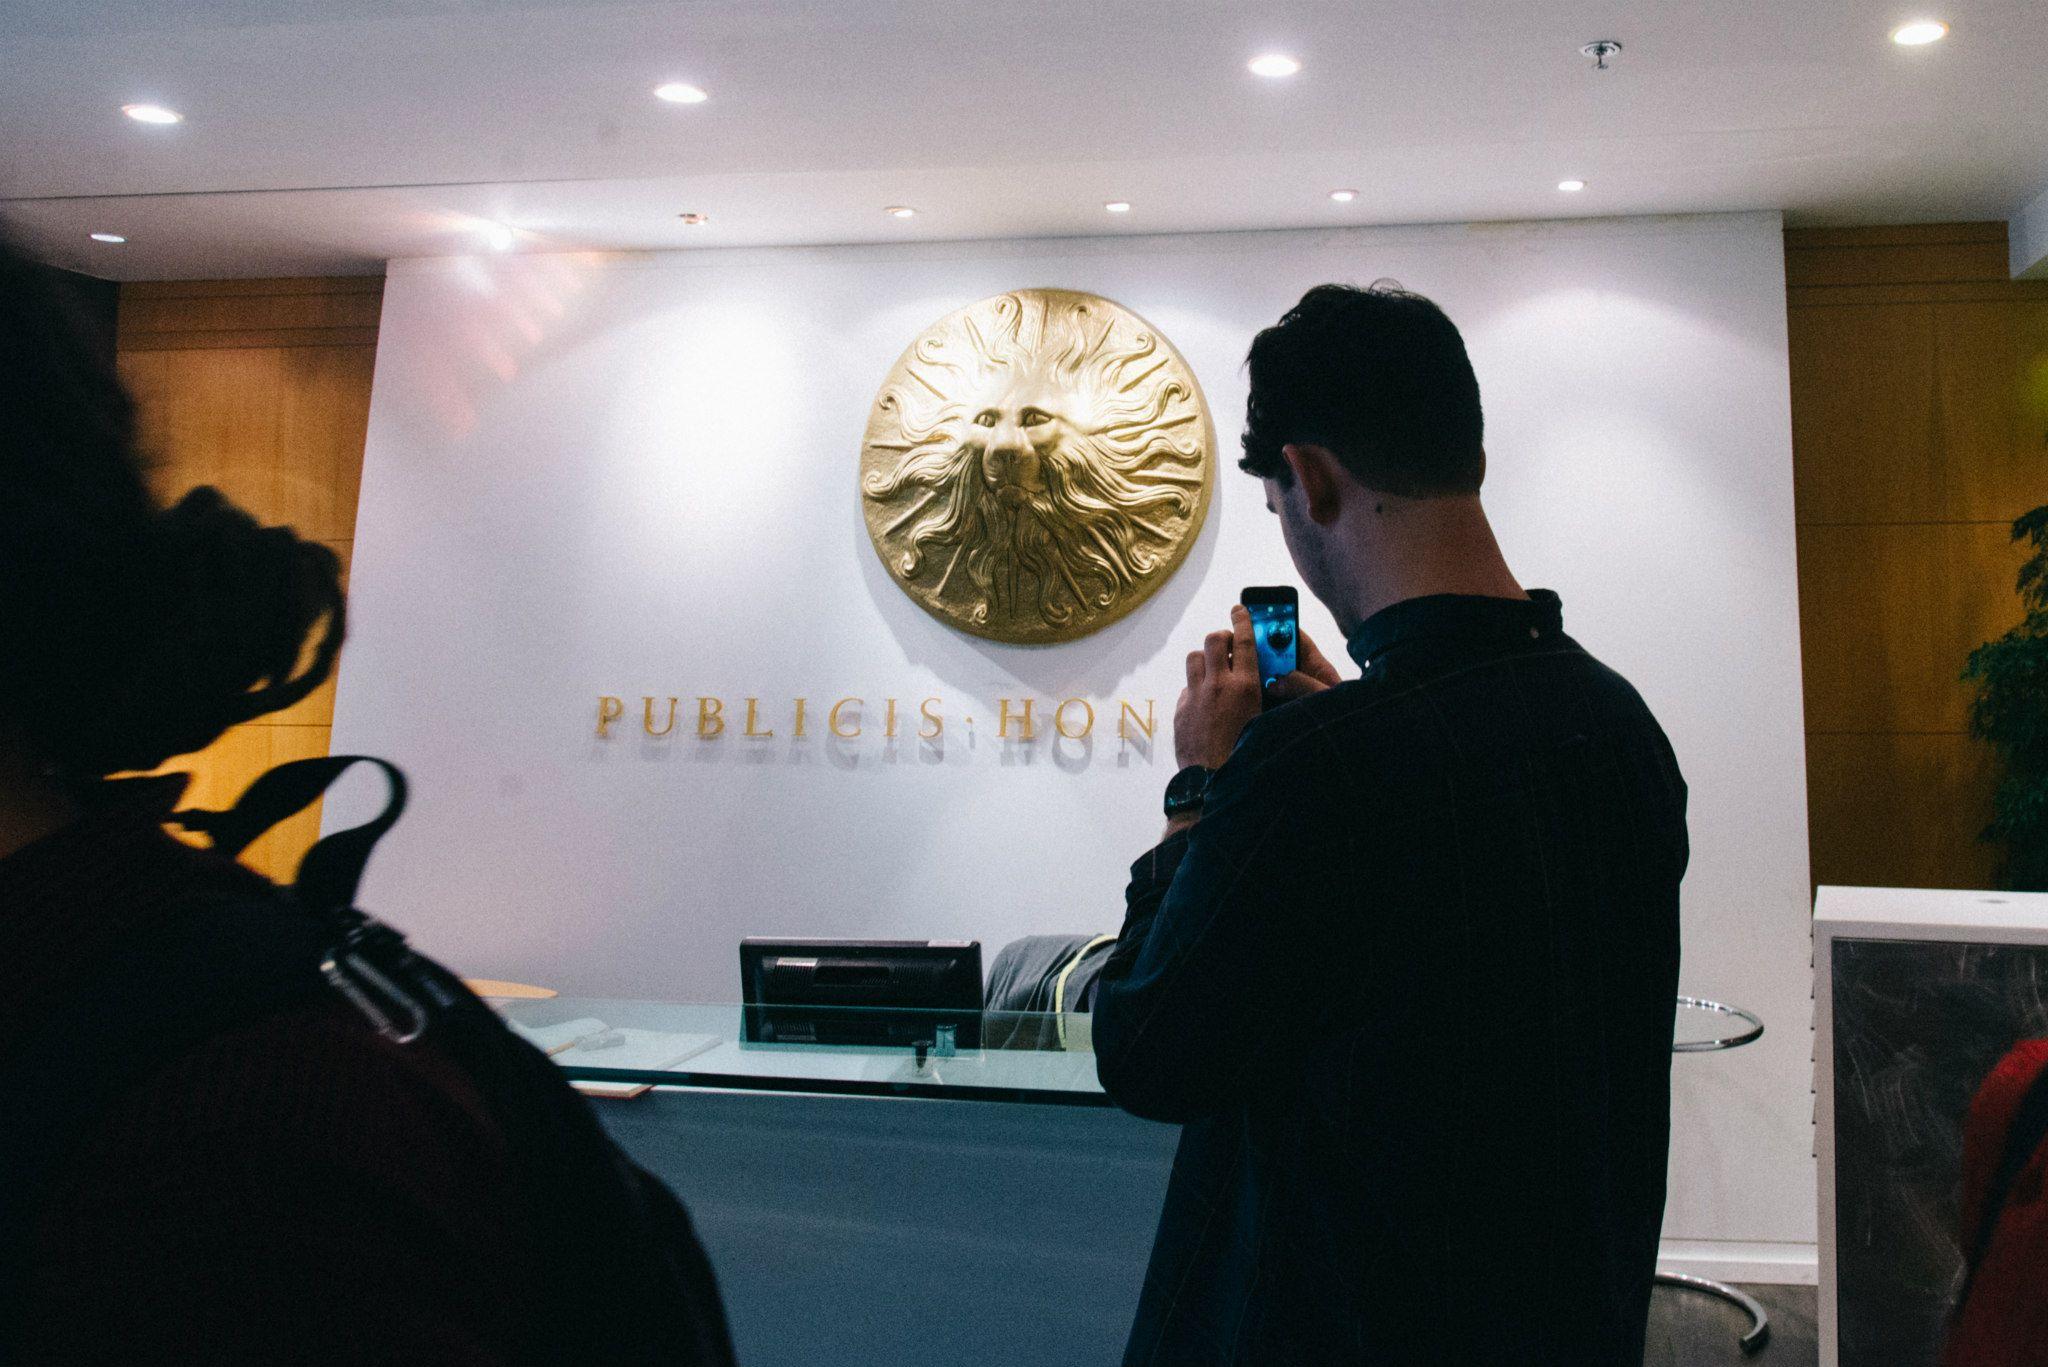 Publicis Hong Kong